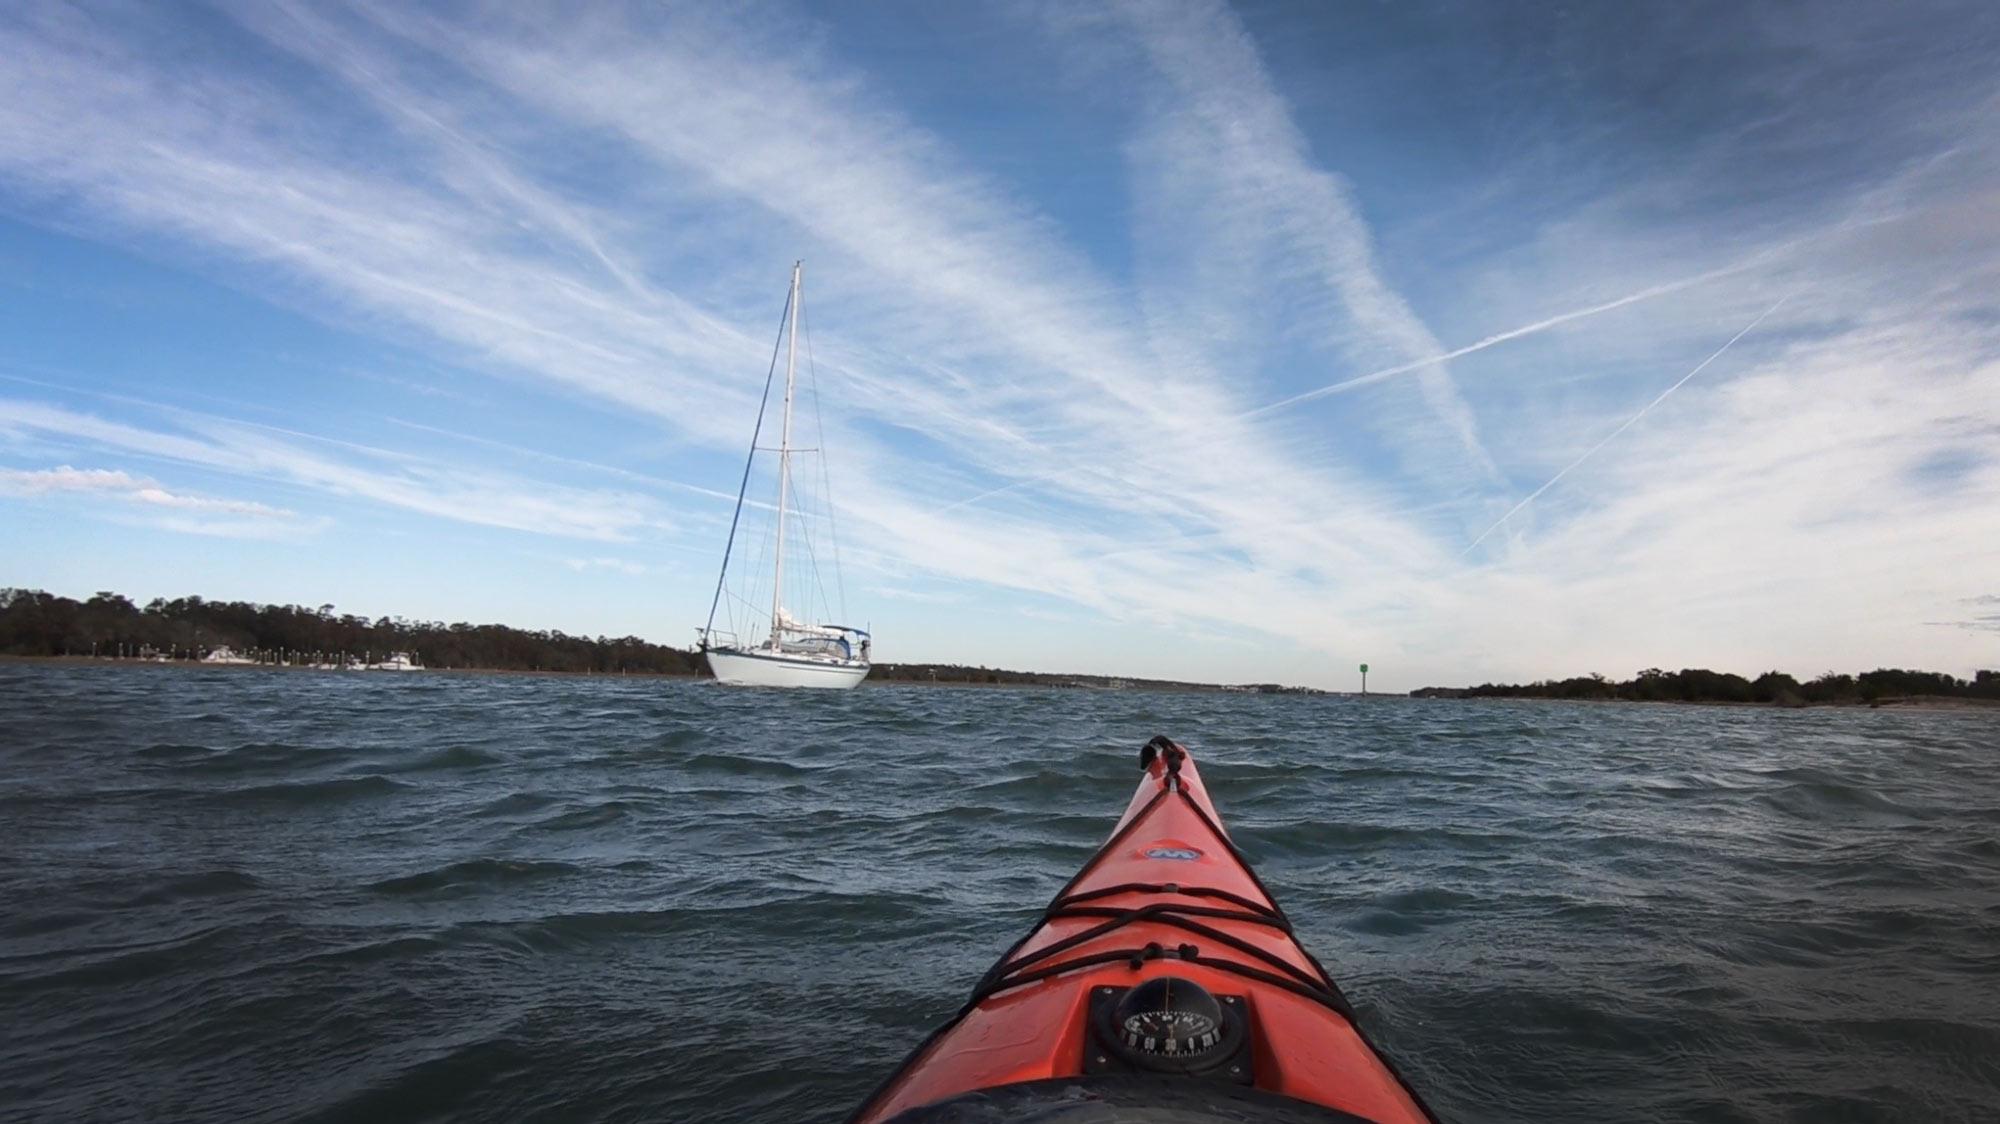 Kayak on Intercoastal Waterway heading toward Masonboro Island, North Carolina